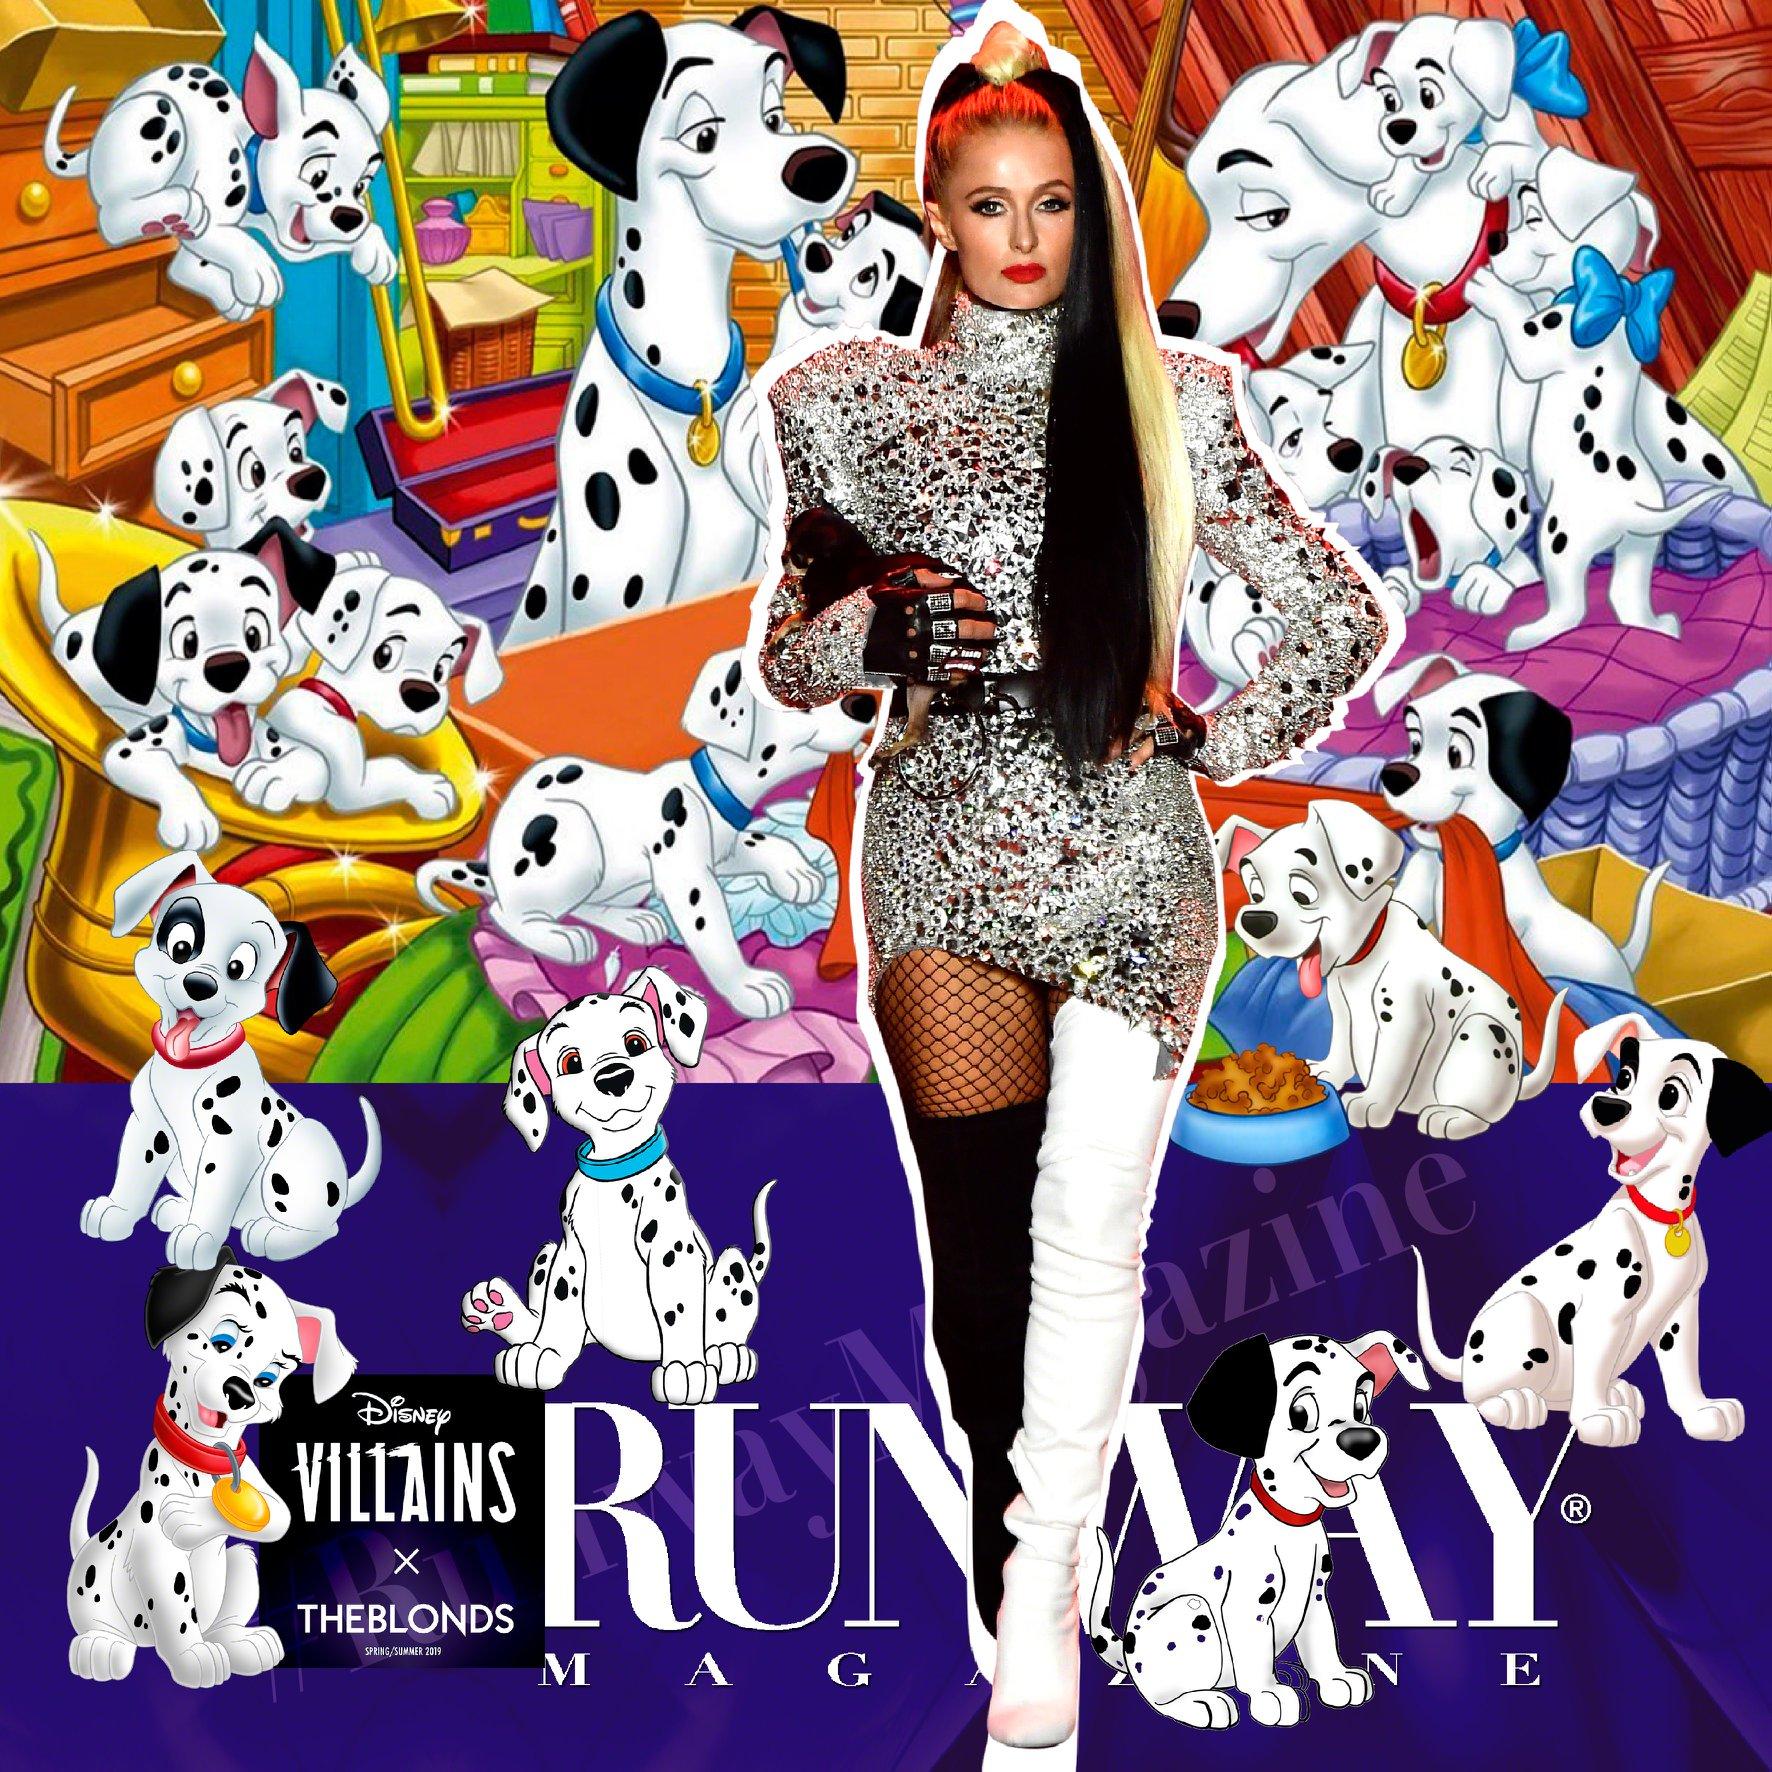 Boohoo Com X Paris Hilton New Collaboration: Disney Villains And The Blonds